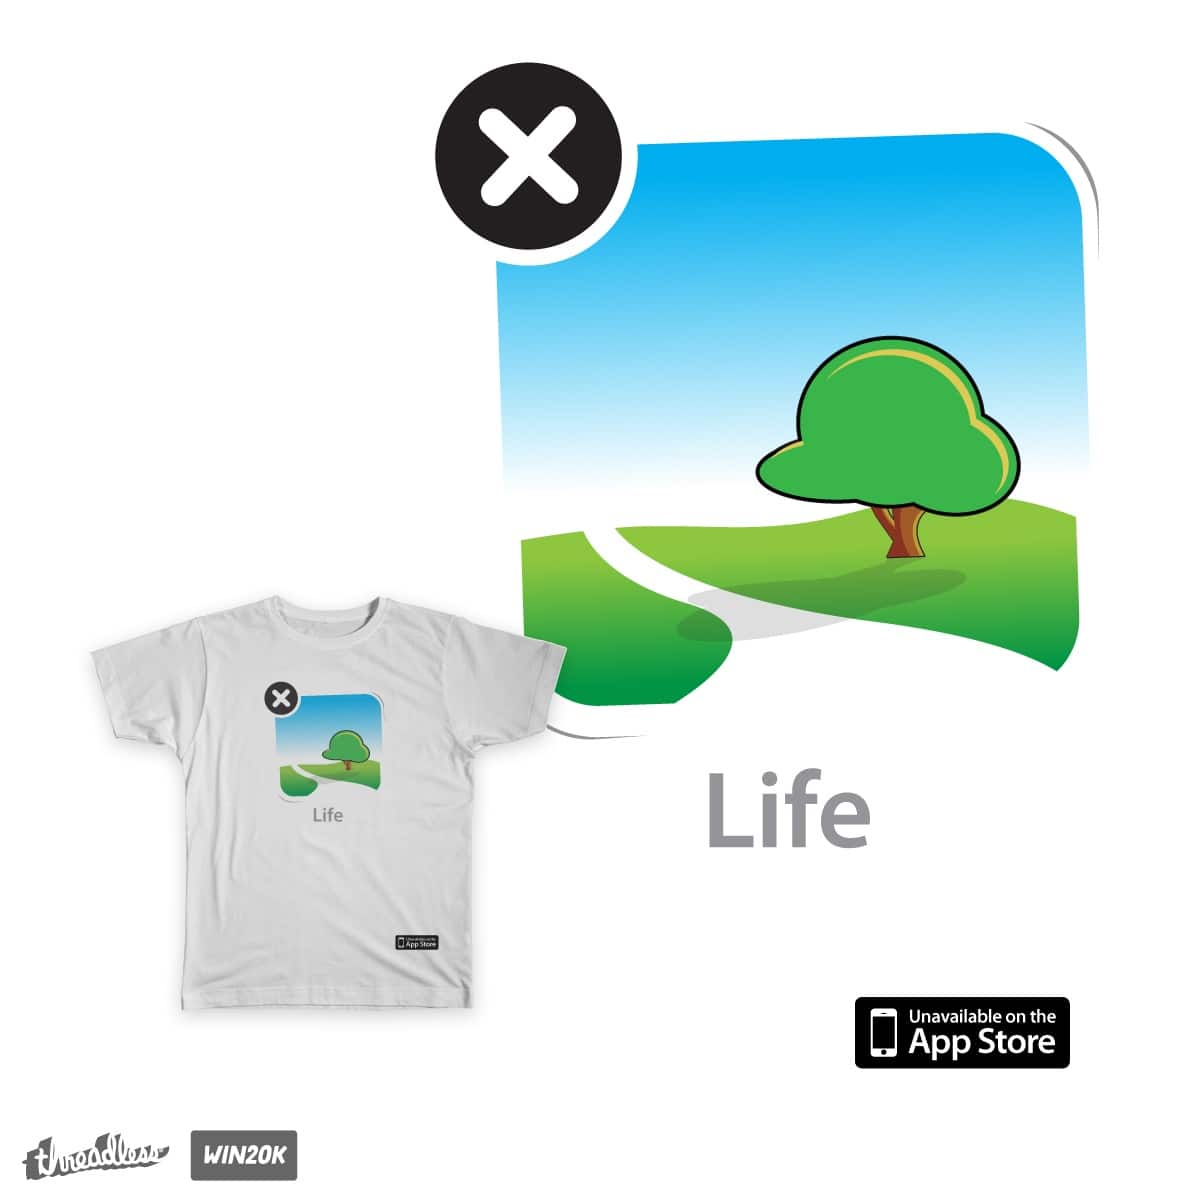 Life App by stuartwitts on Threadless